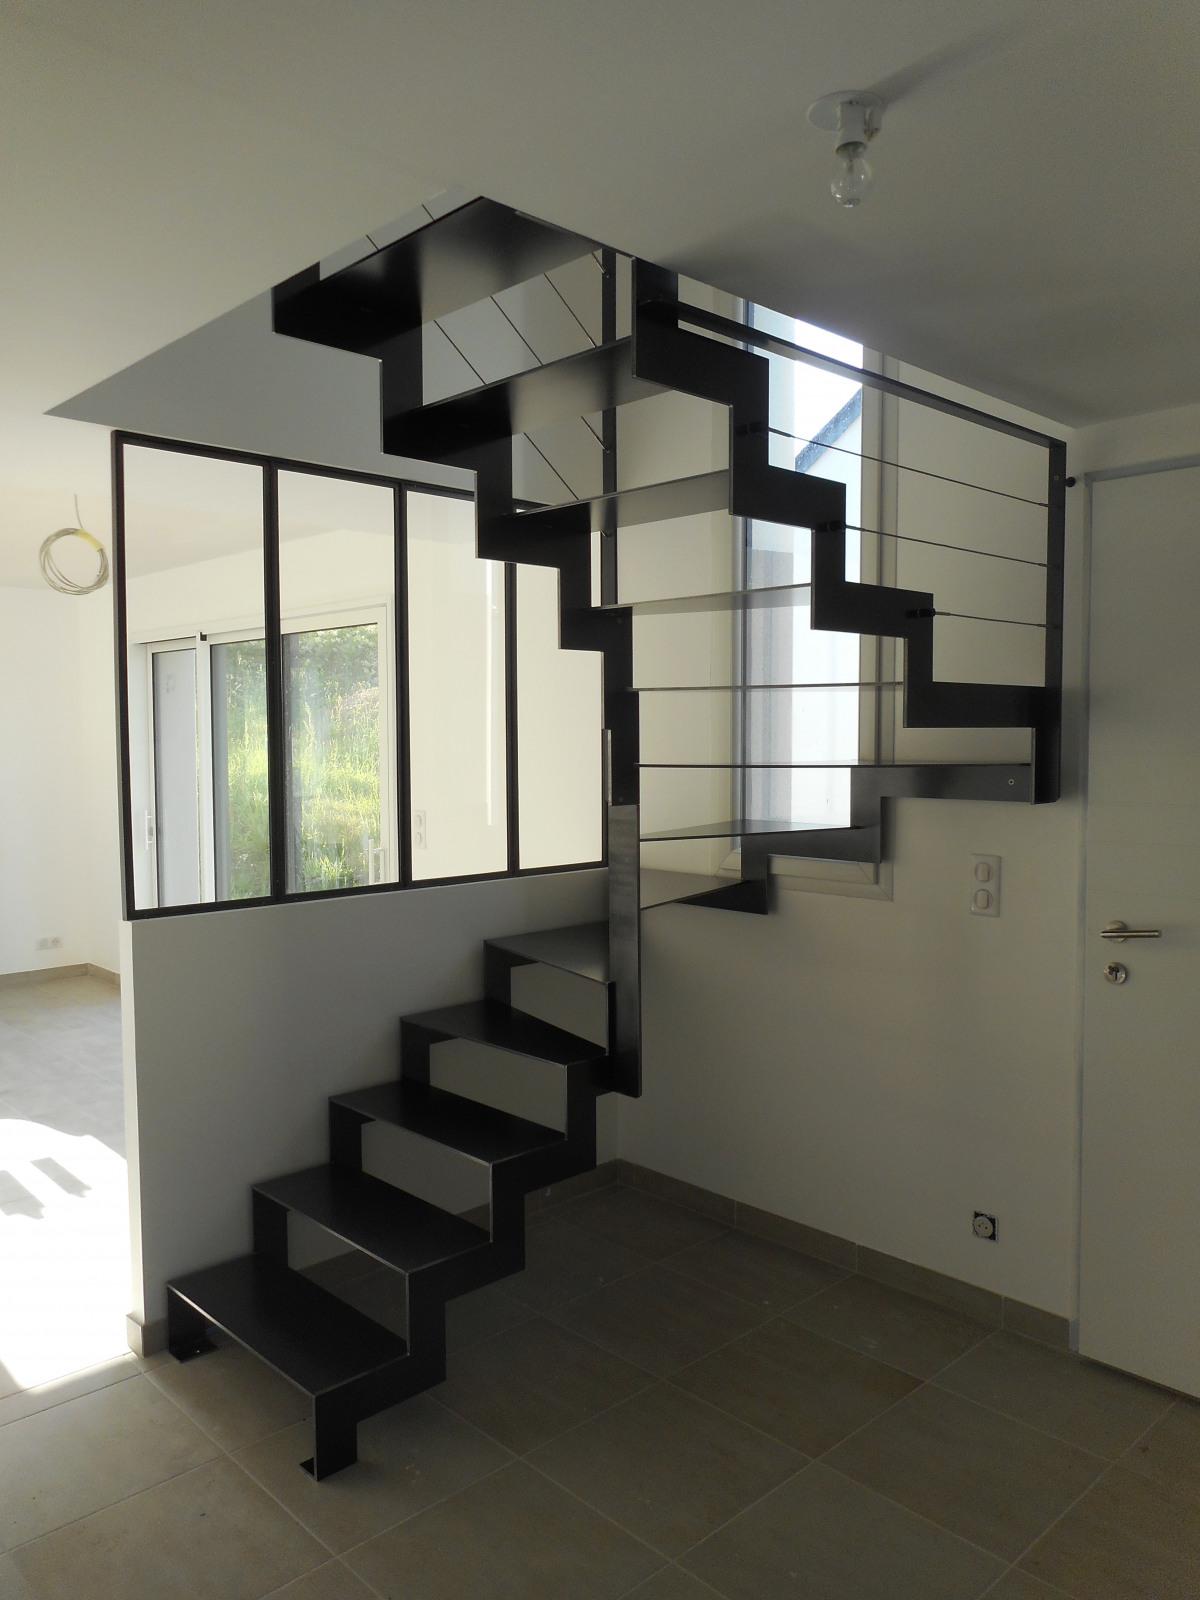 david neau architecte cabinet d 39 architecte nantes archidvisor. Black Bedroom Furniture Sets. Home Design Ideas